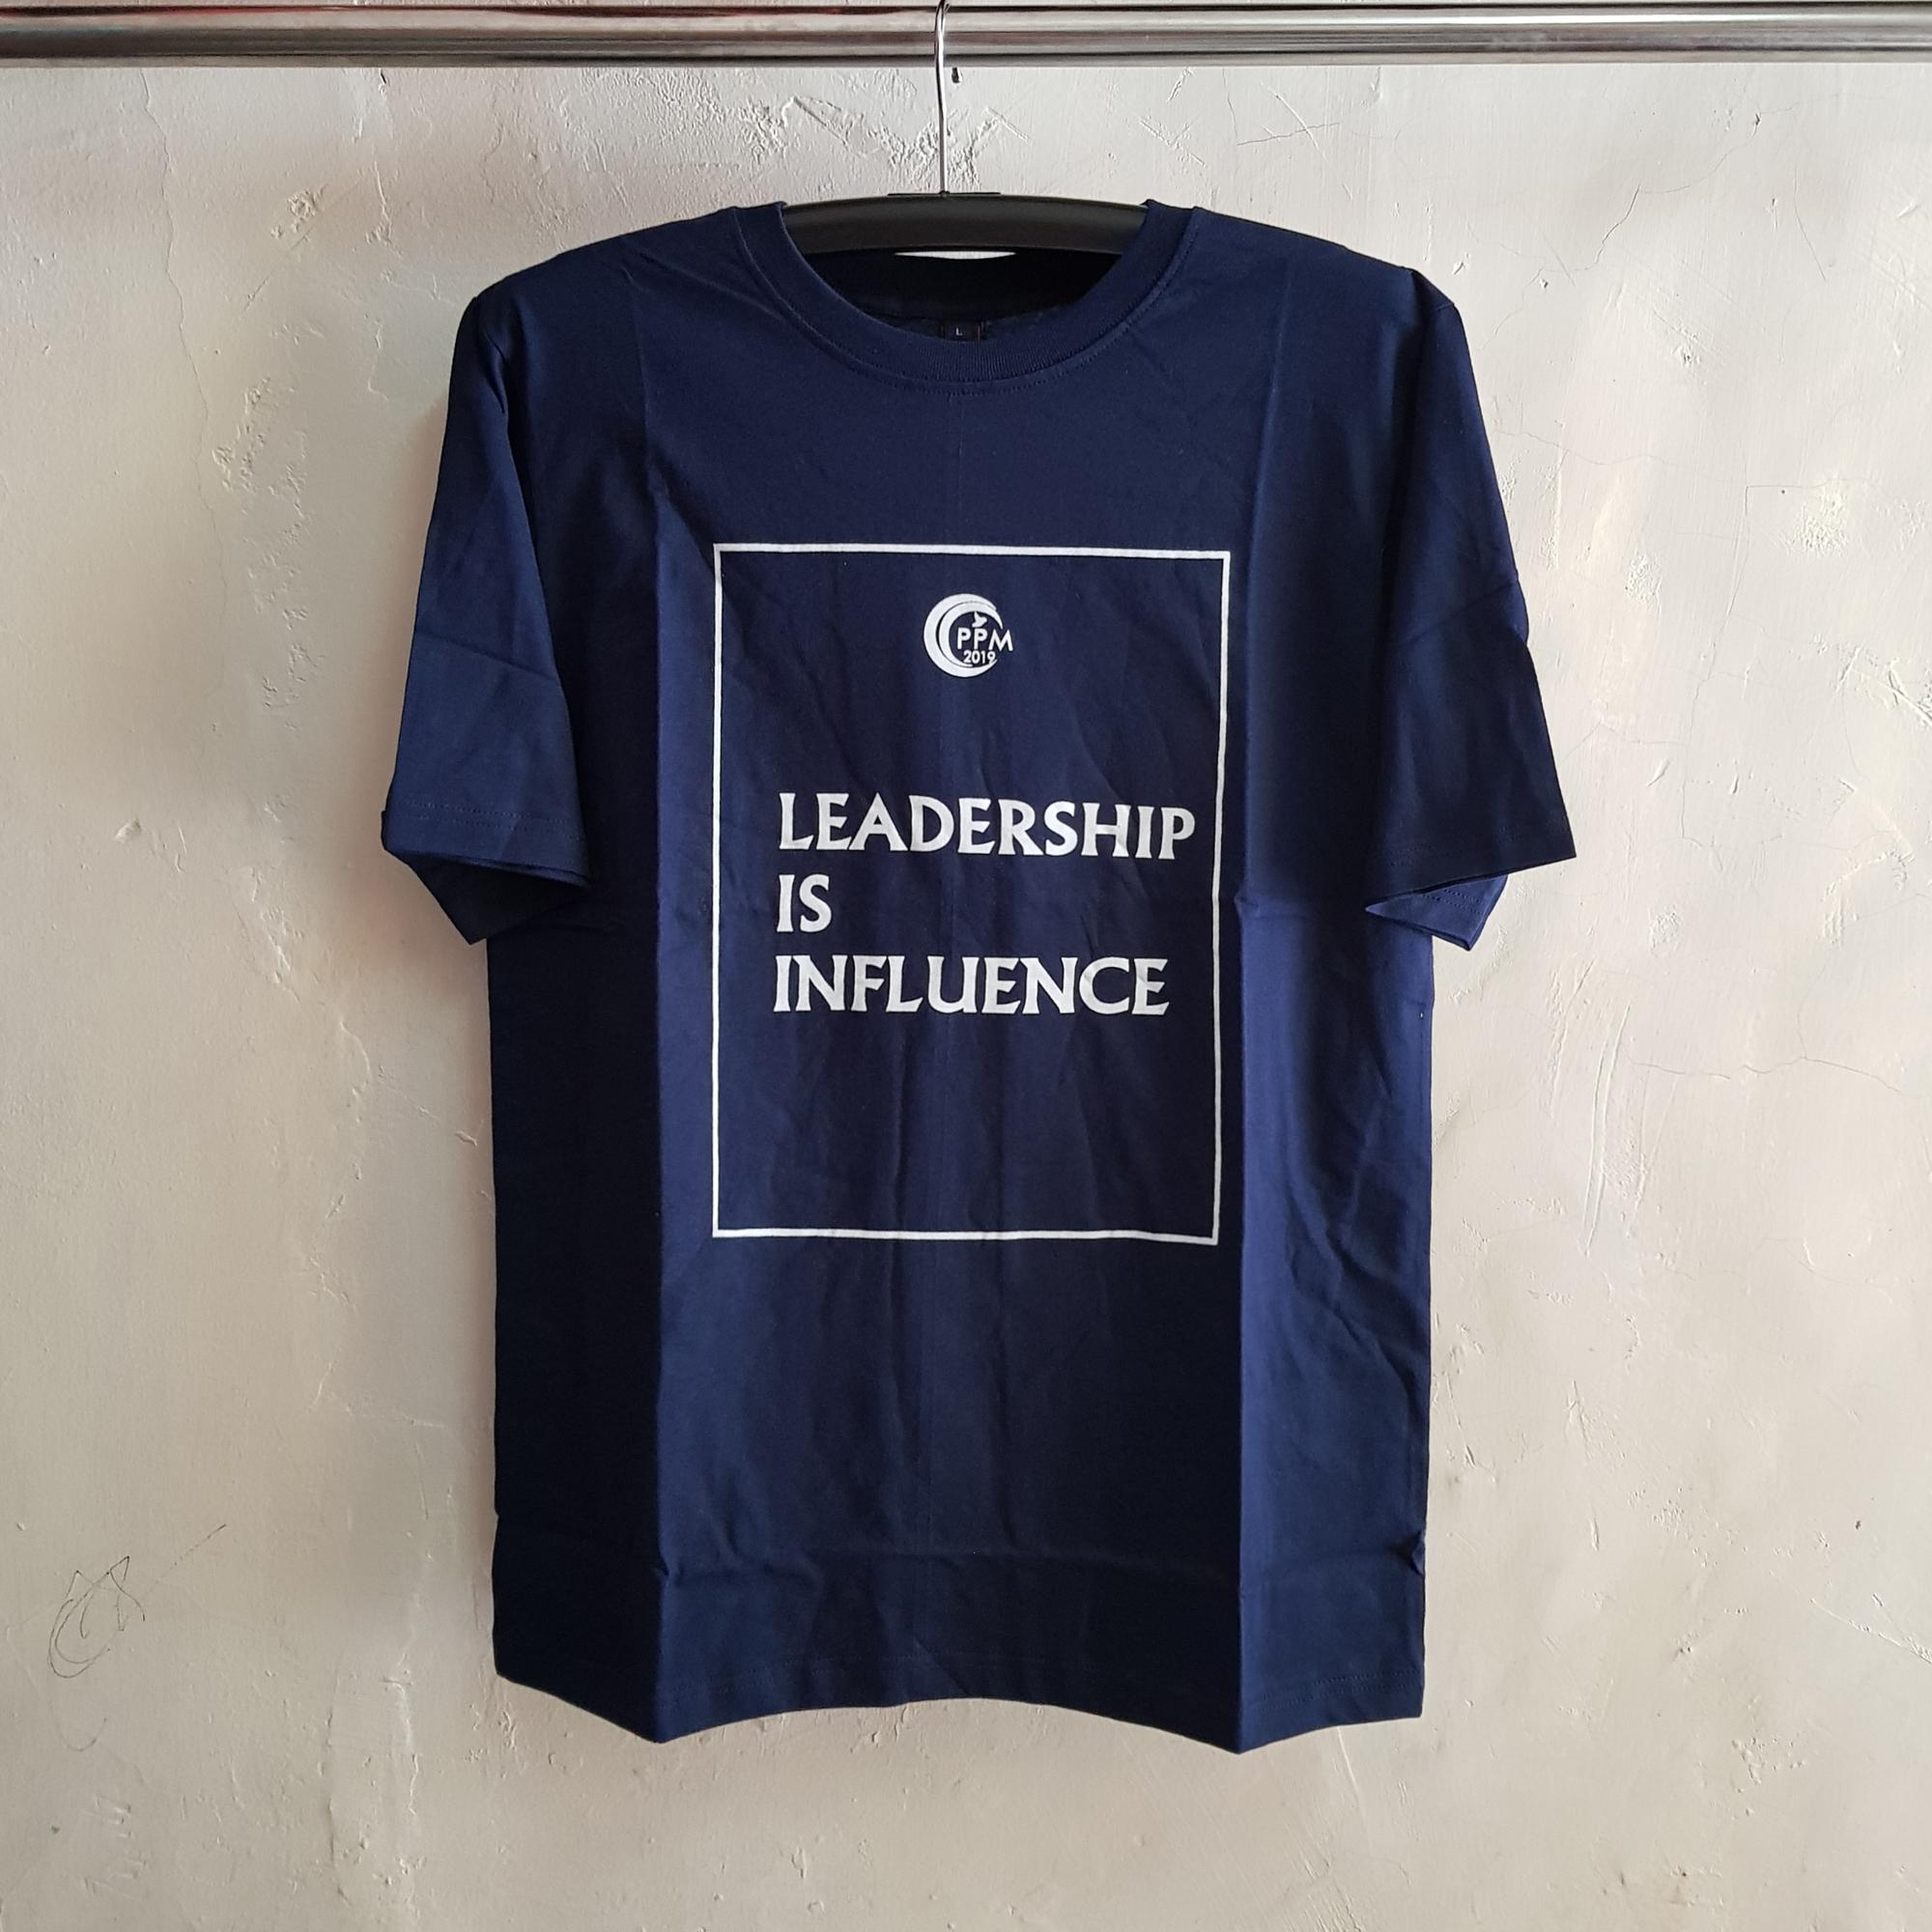 Kaos LII, Seragam T-Shirt Oblong